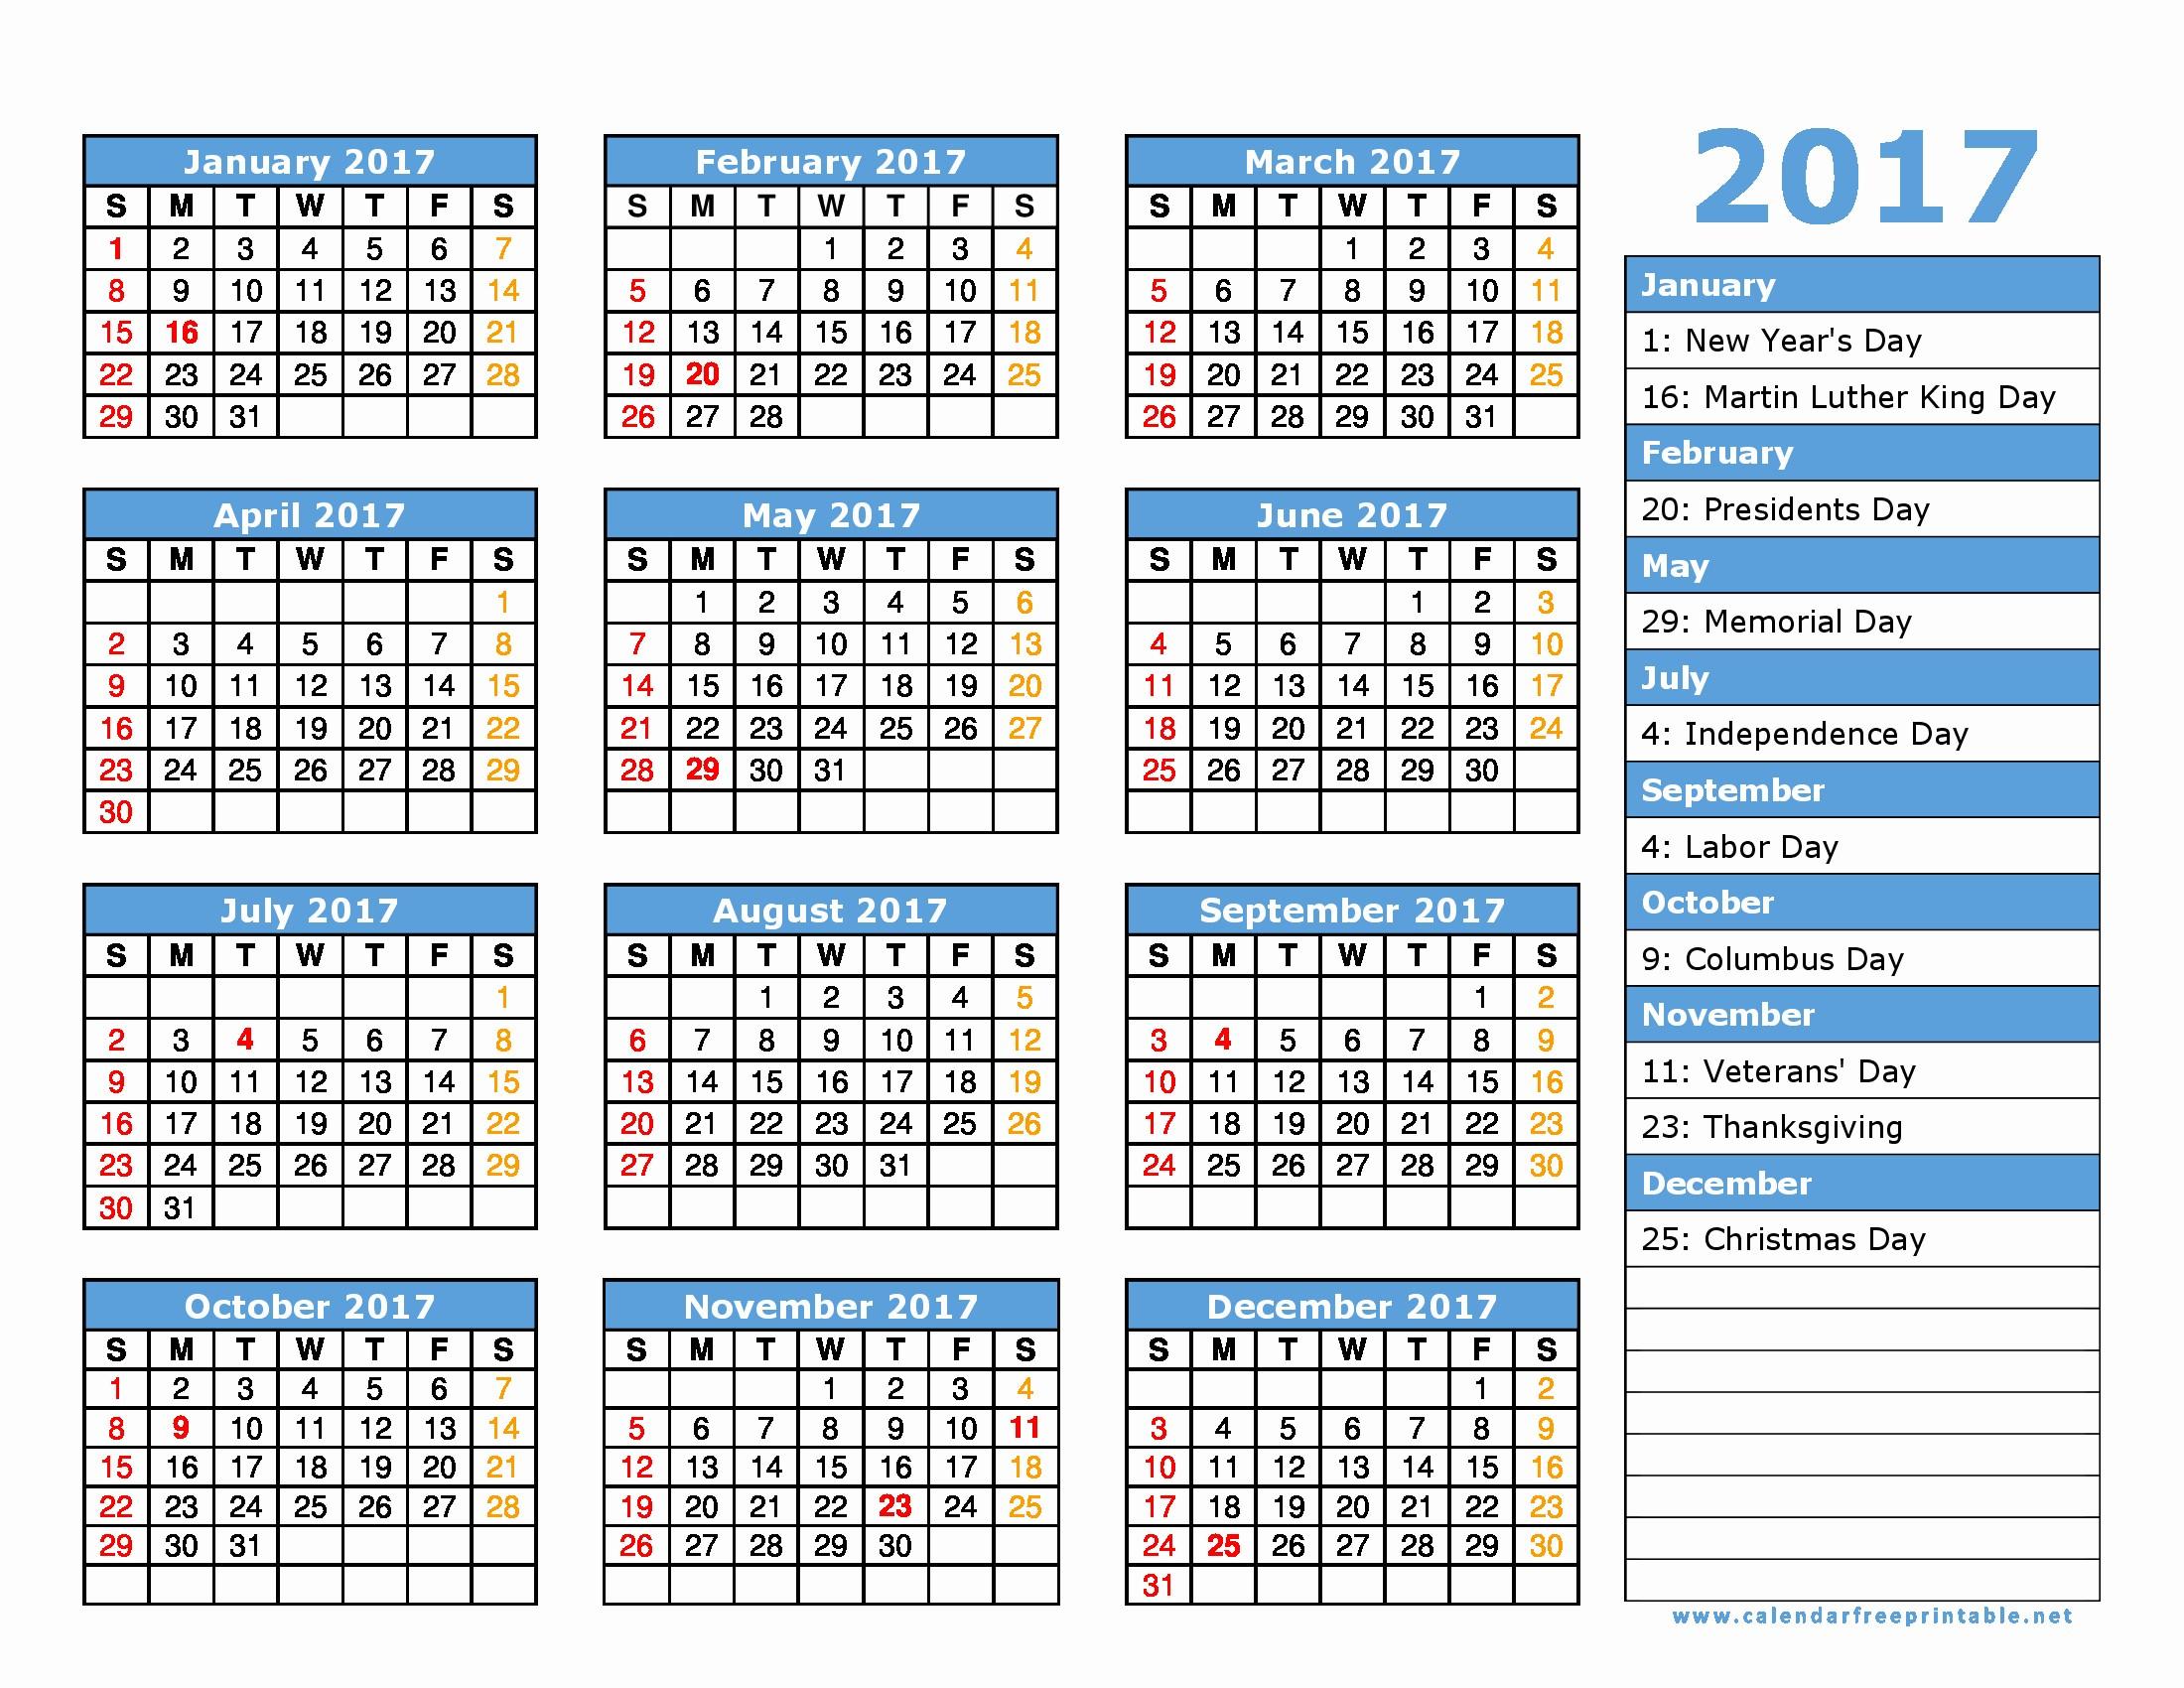 2017 Calendar with Holidays Template Fresh 2017 Calendar Printable with Holidays